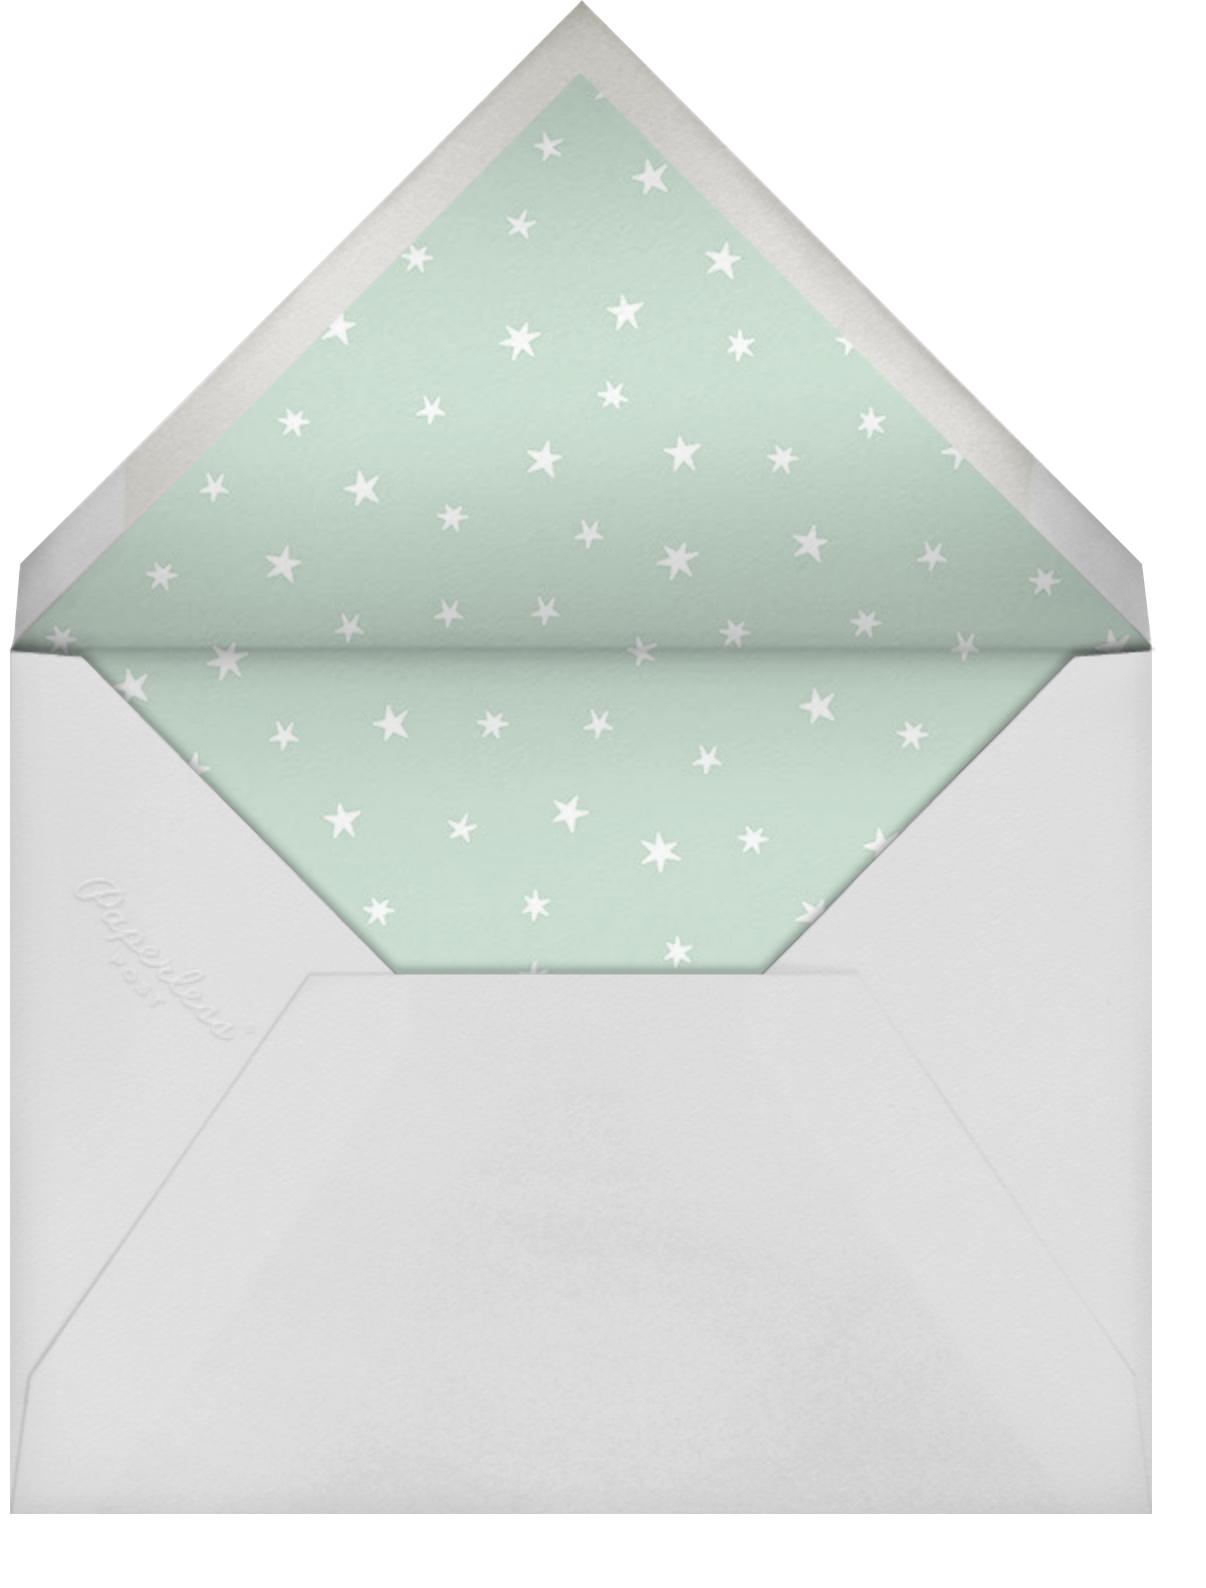 Starry Slumber (Stationery) - Monkey - Paperless Post - Baby and kids' - envelope back